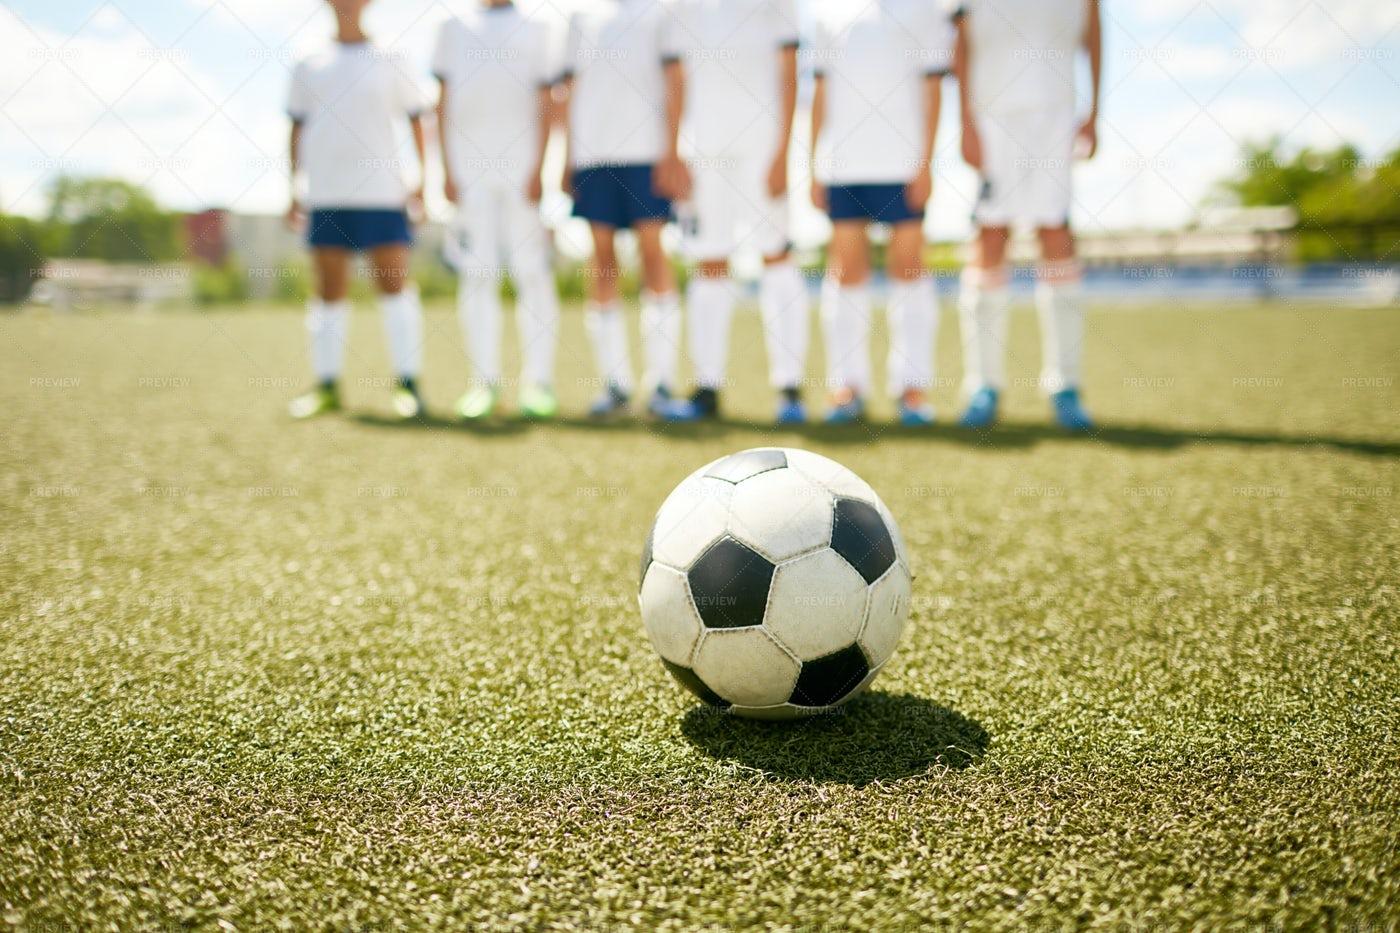 Ball On Grass In Football Field: Stock Photos